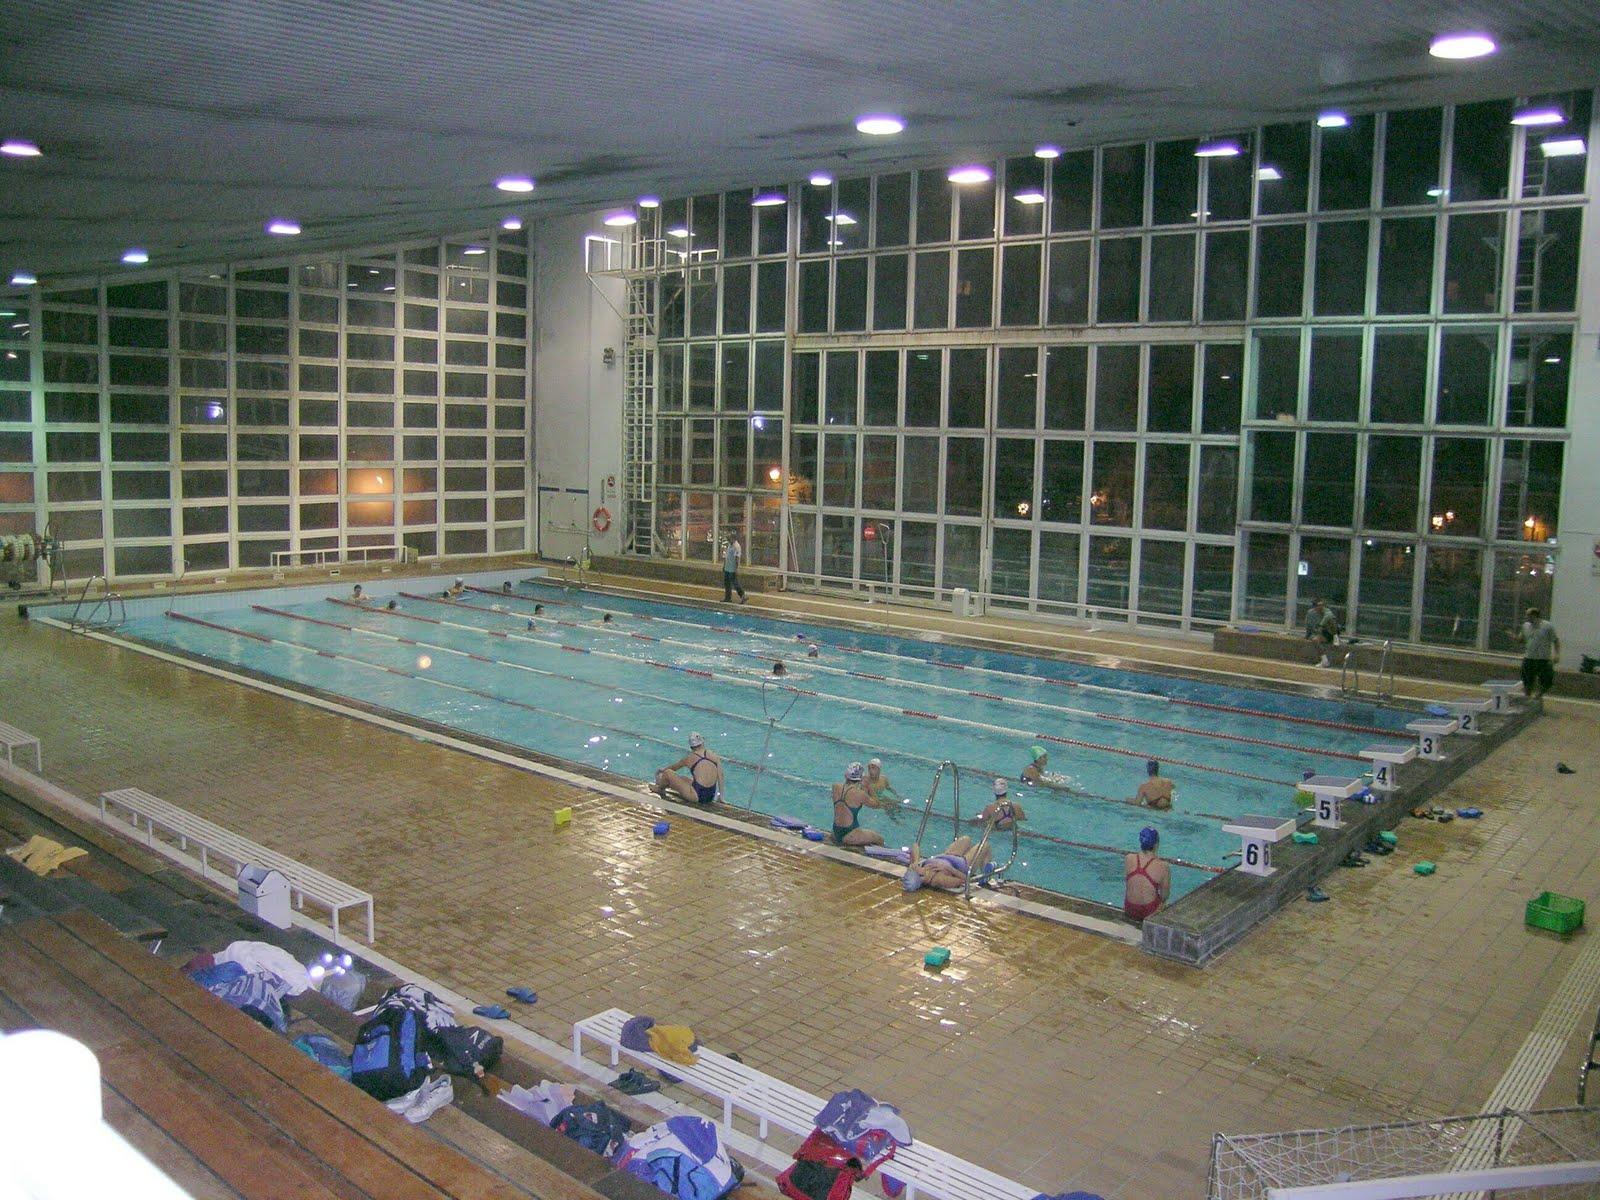 No s lo existe el nadadador a de lite coral fern ndez nadamos asociacion de nadadores - Agora piscina latina ...